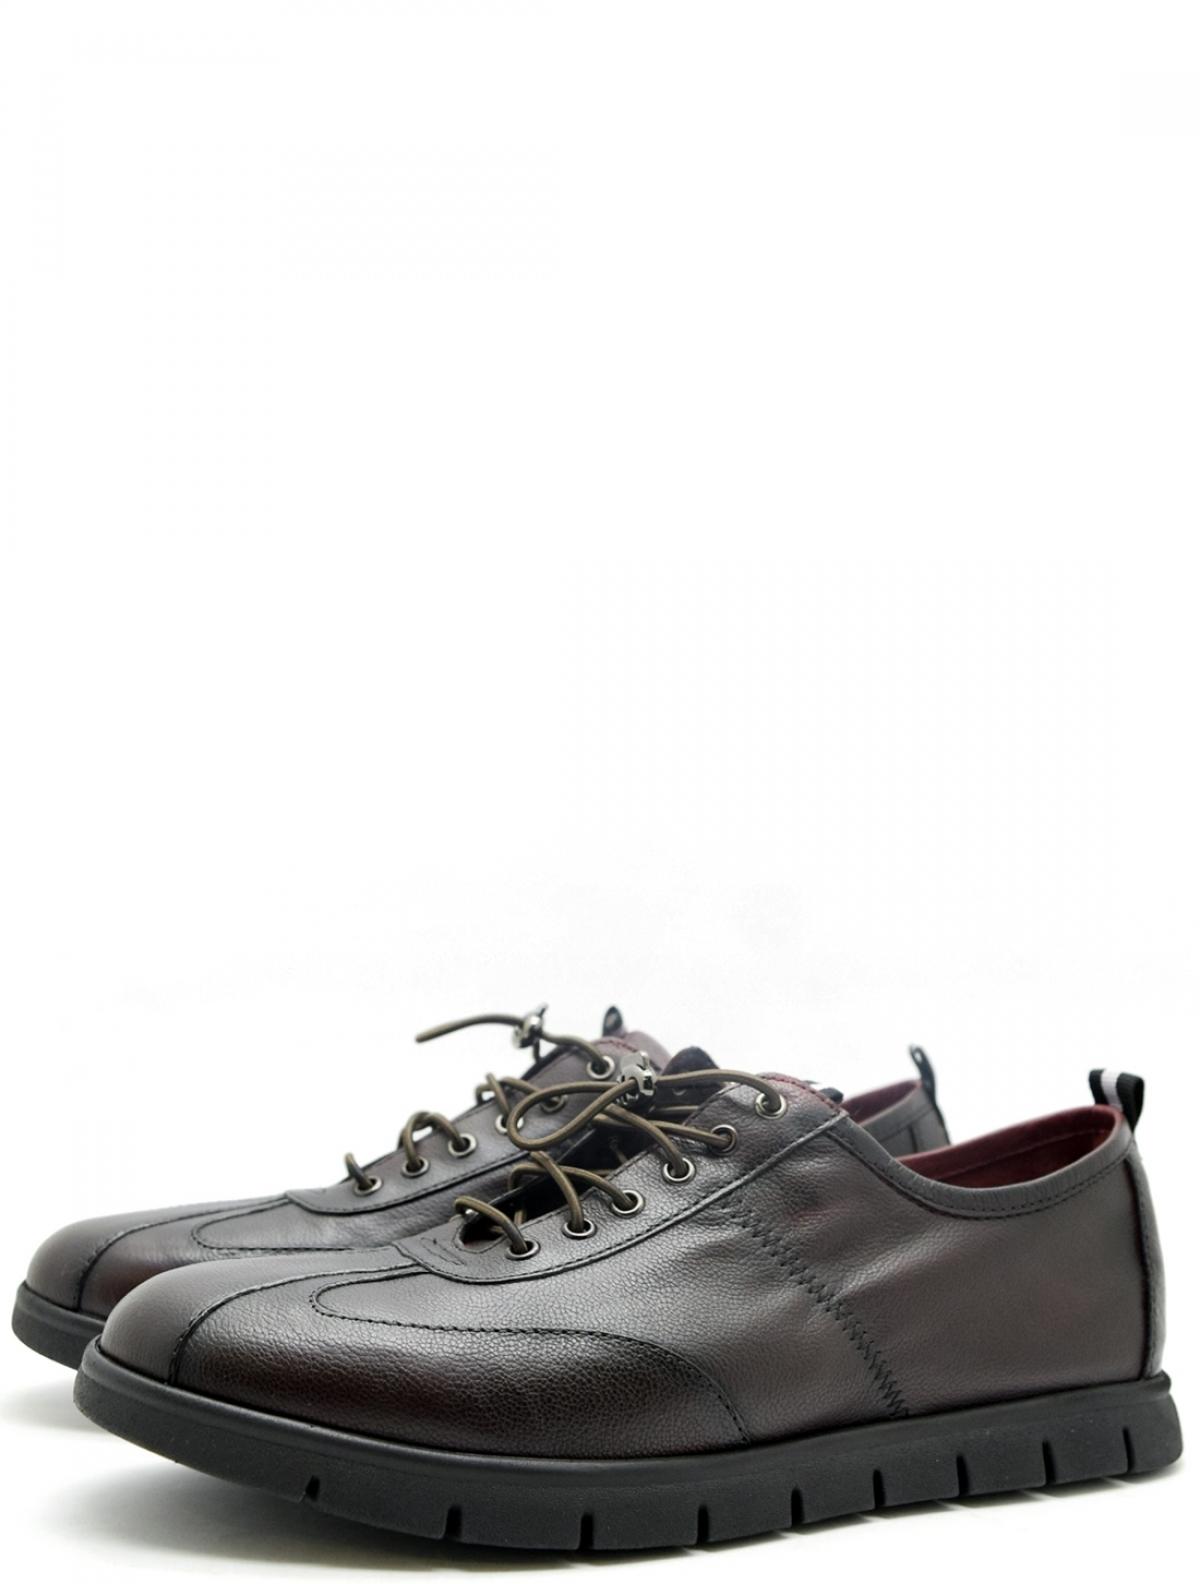 Roscote 800501-XA95-T2525 мужские туфли